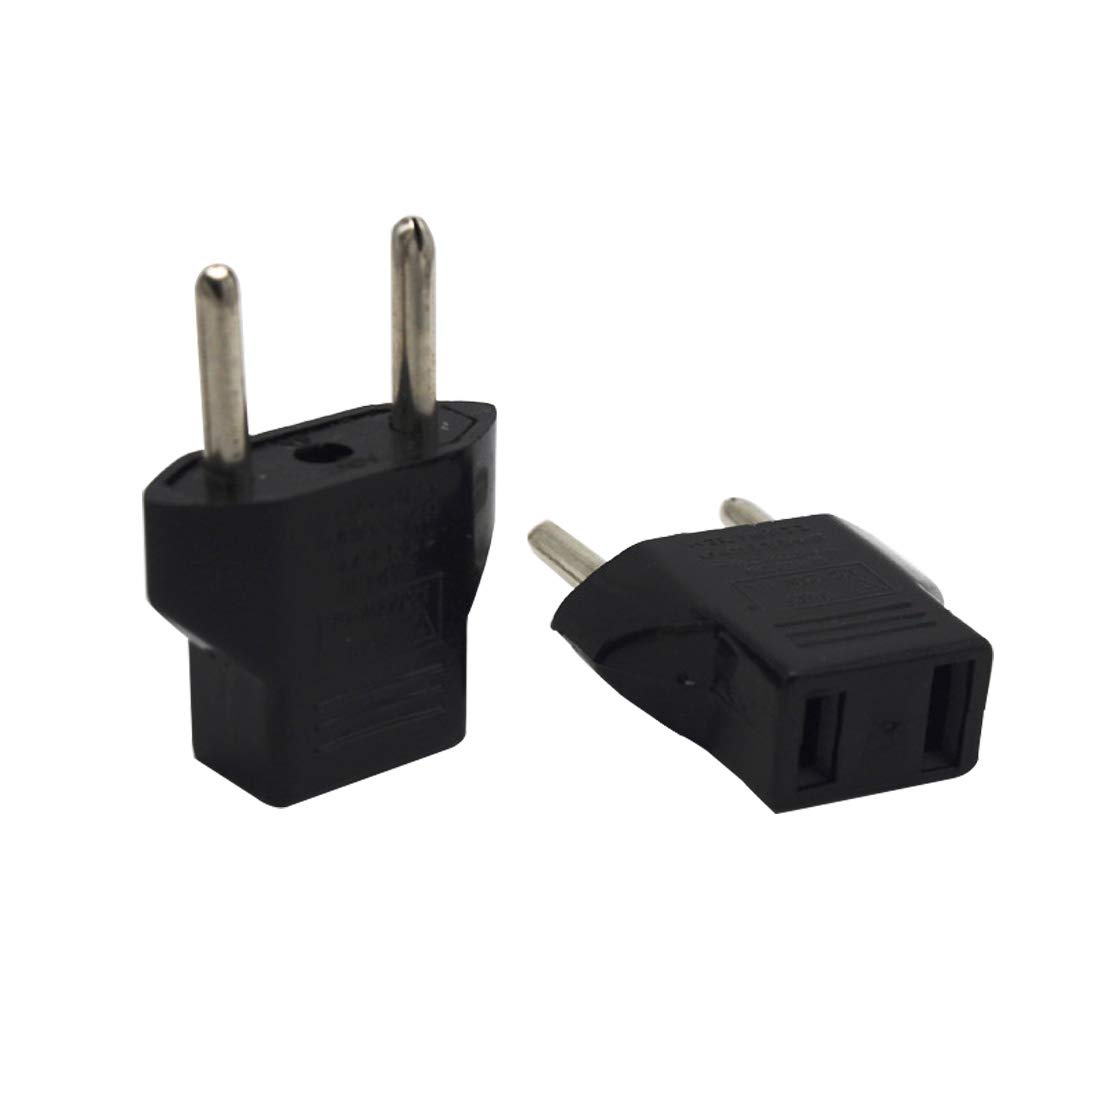 Loweryeah US to European Plug Adapter Premium Power Converter (2 Pieces)